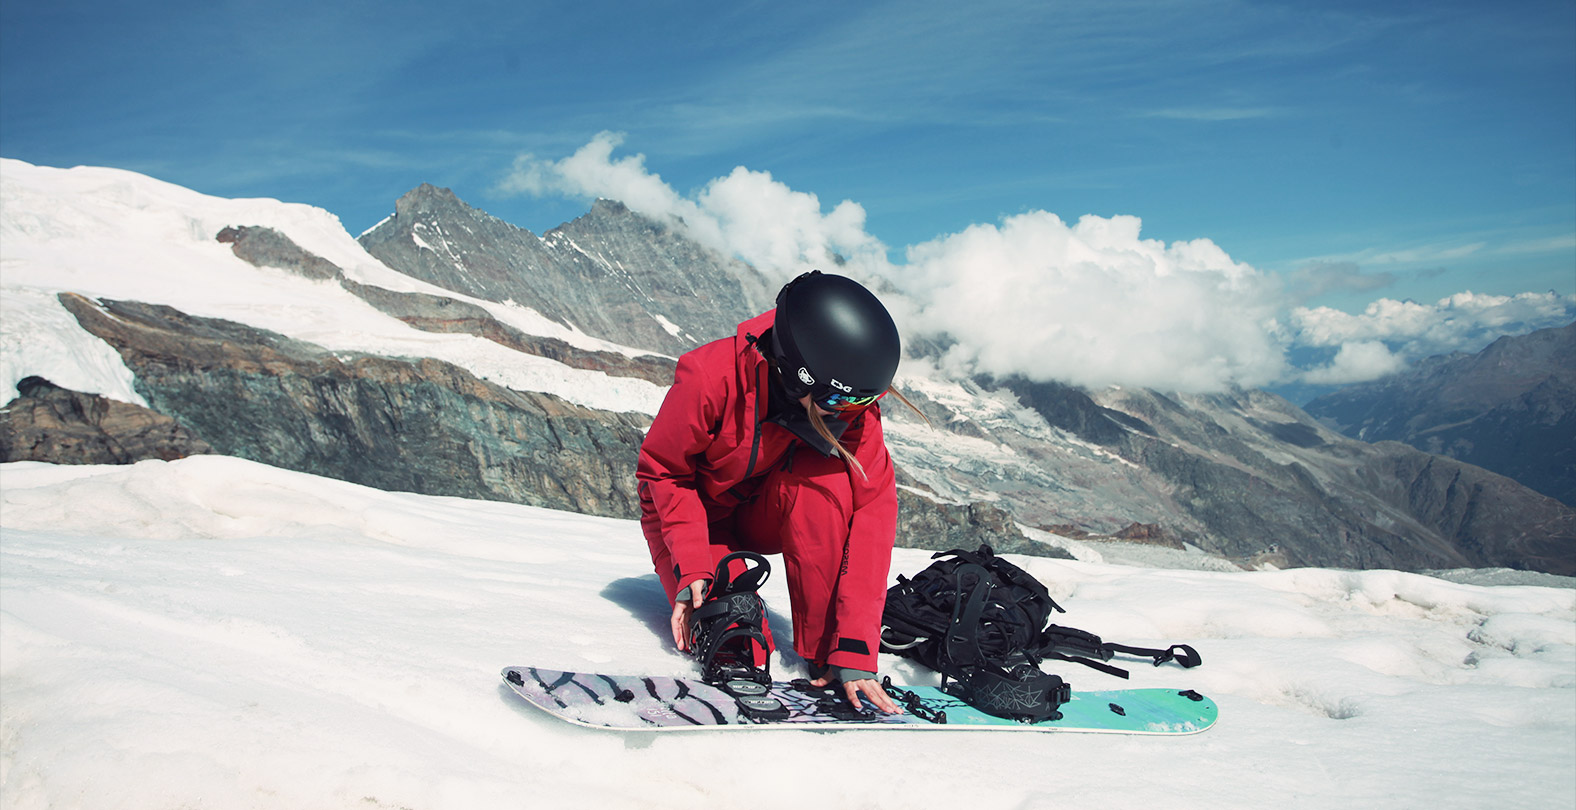 Preparing your splitboard to ride down